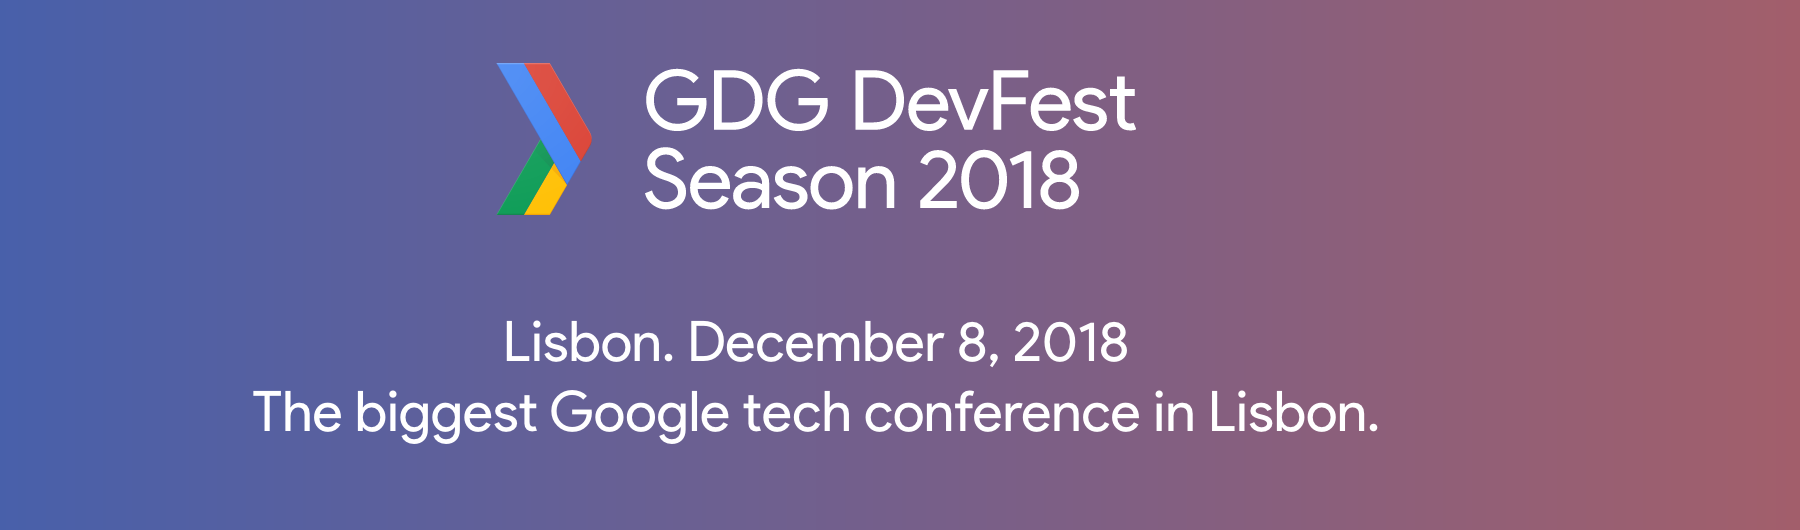 GDG DevFest Lisbon'18